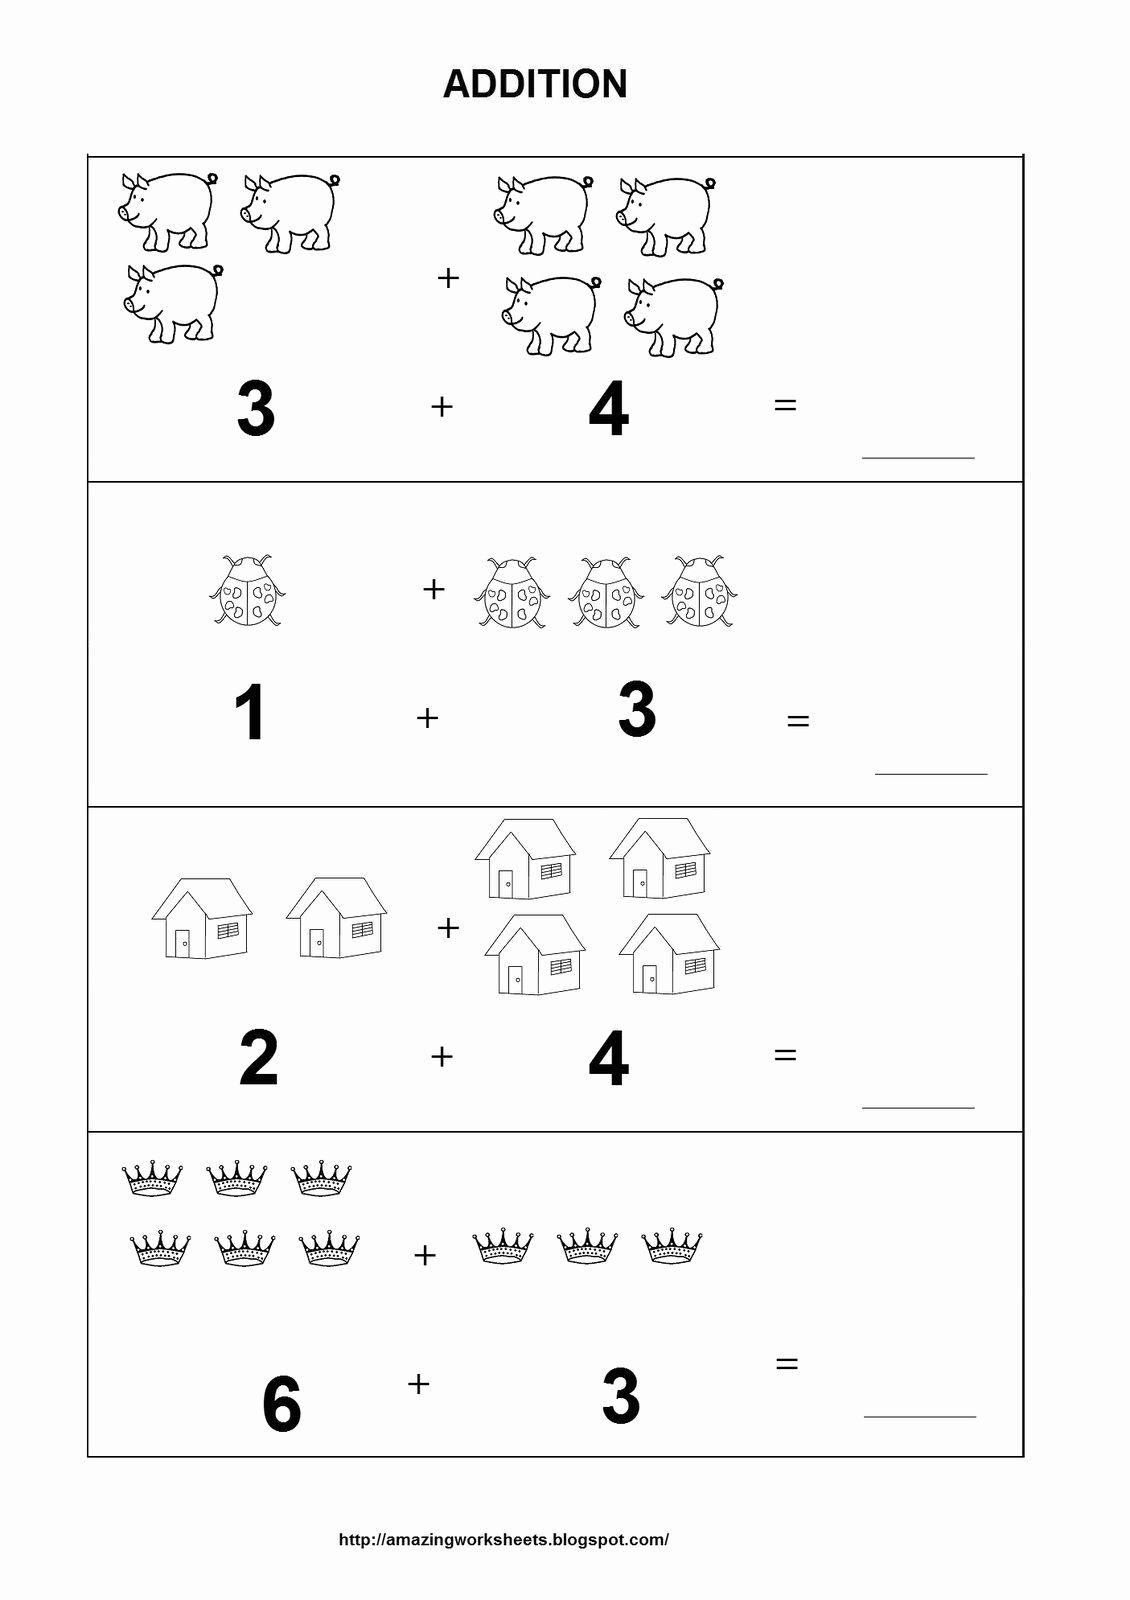 Free Mathematics Worksheet For Kindergarten In 2020 Kindergarten Math Worksheets Free Printable Math Worksheets Basic Math Worksheets